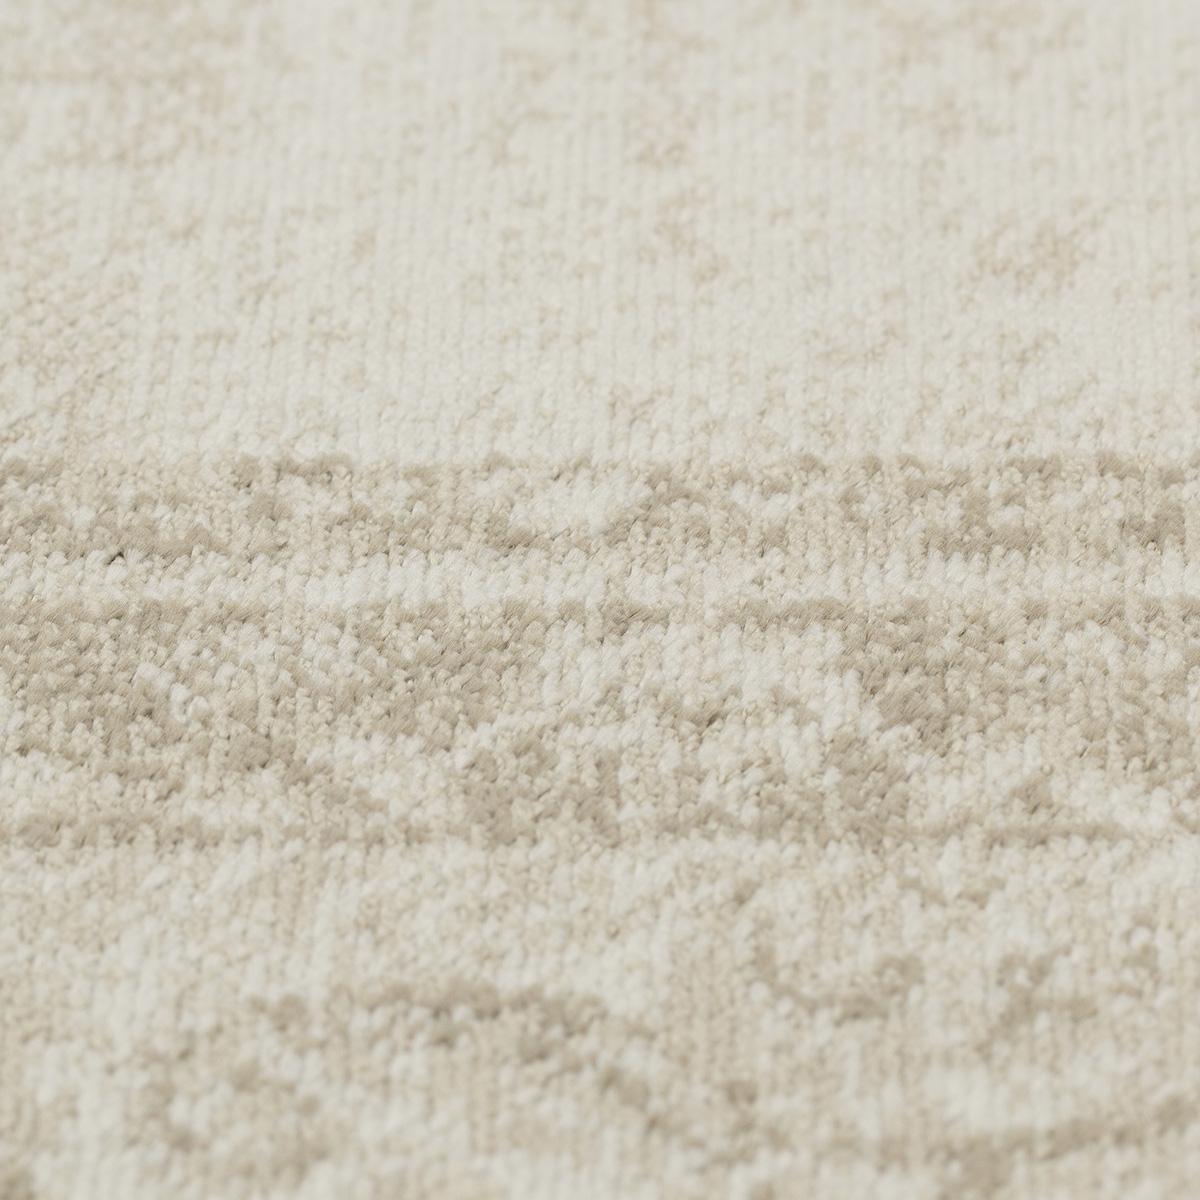 Vloerkleed Brinker Eclipss Sand | 160 x 230 cm